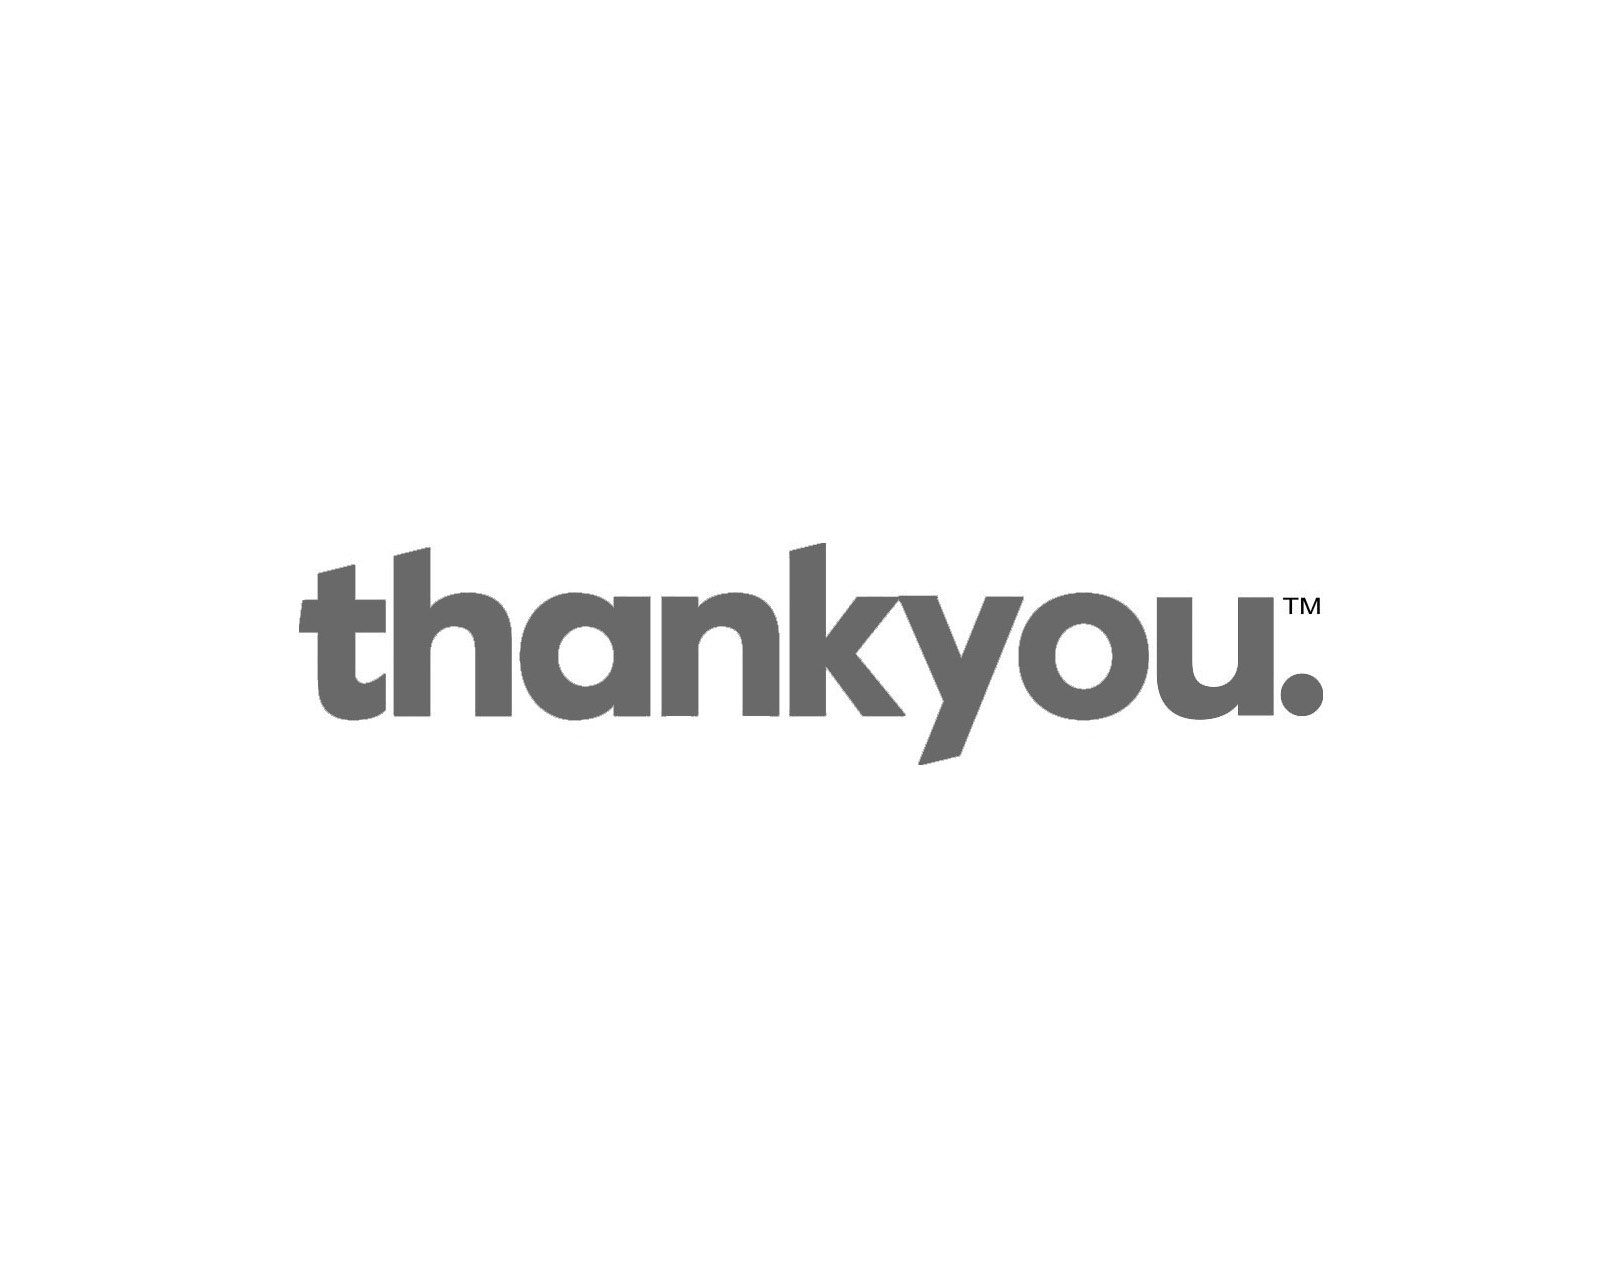 thankyou-logo-1024x222.jpg